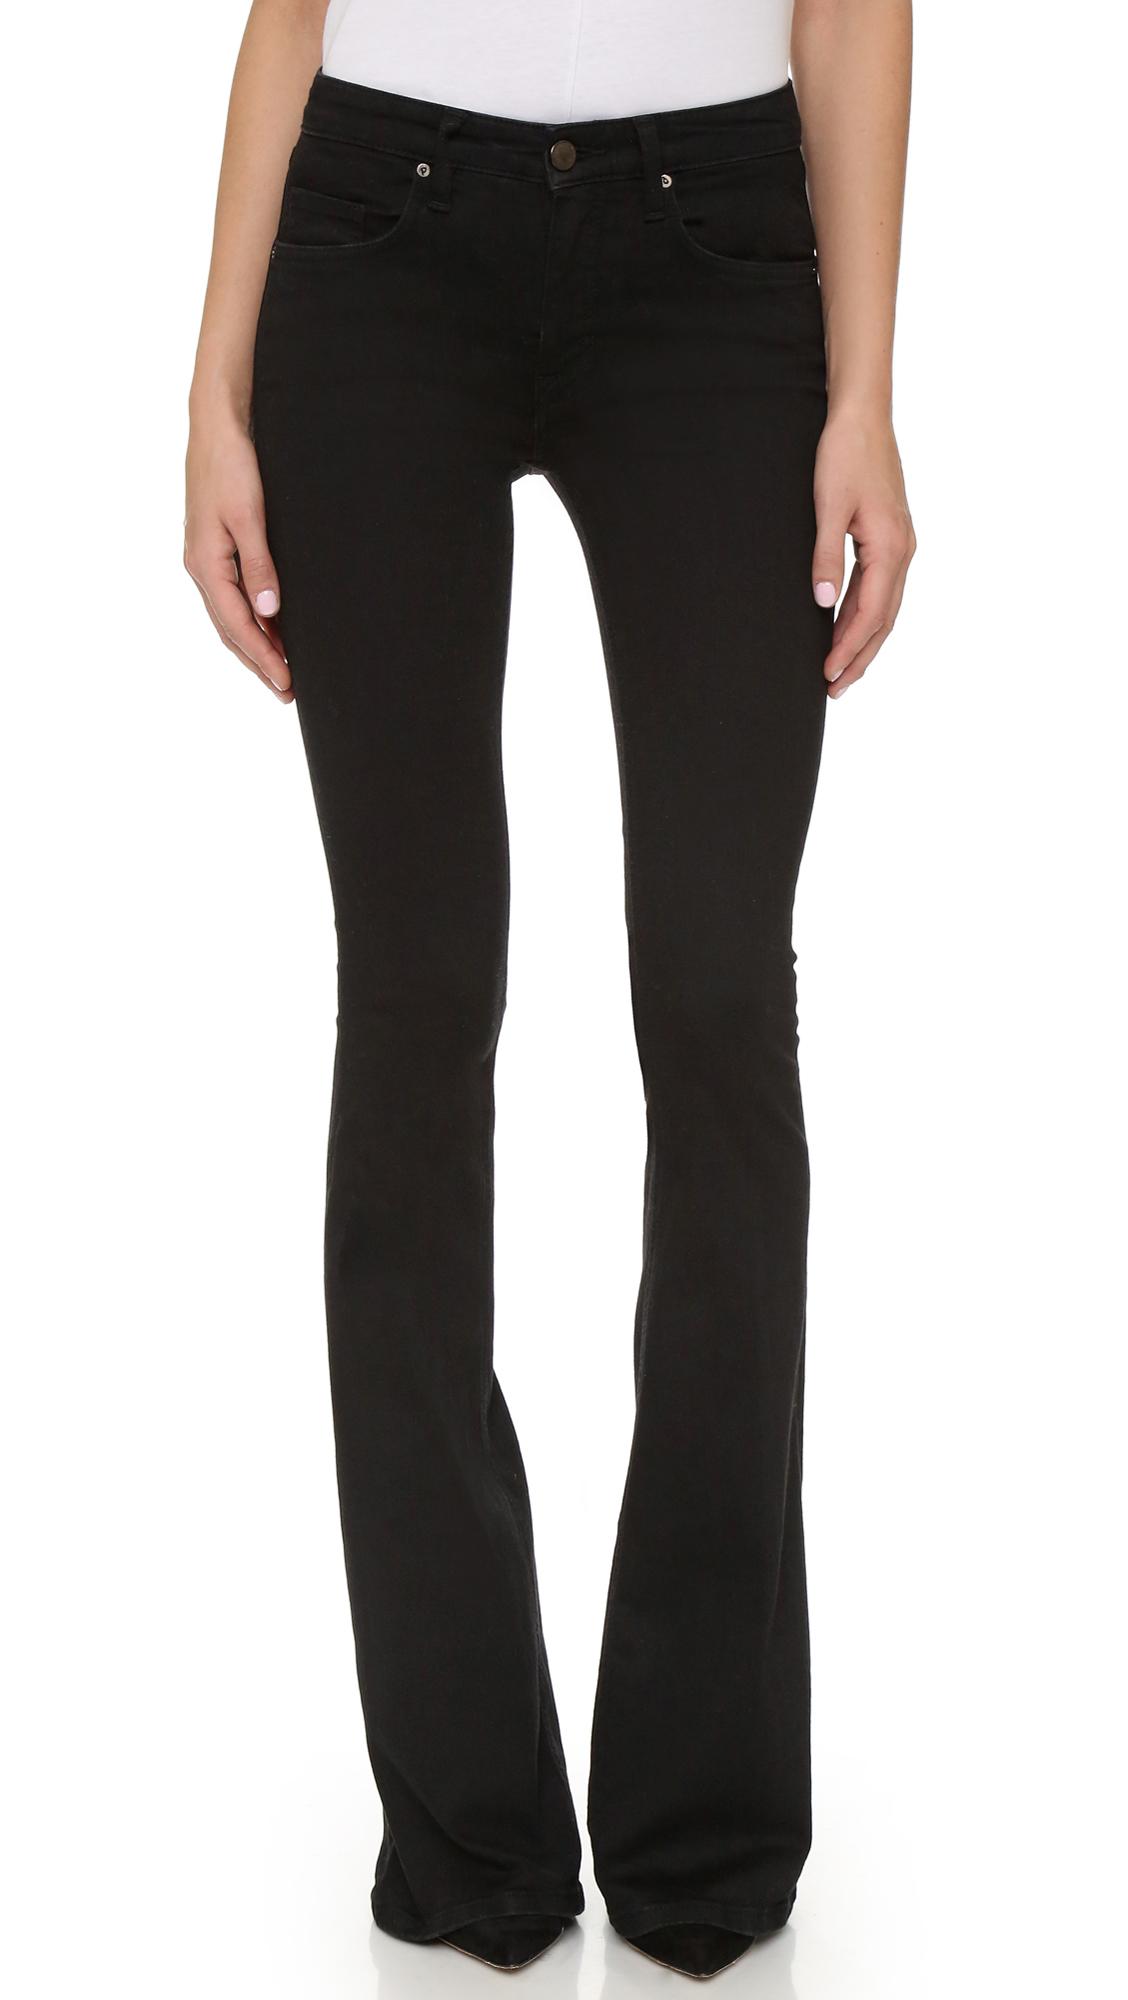 victoria victoria beckham flare jeans in black lyst. Black Bedroom Furniture Sets. Home Design Ideas